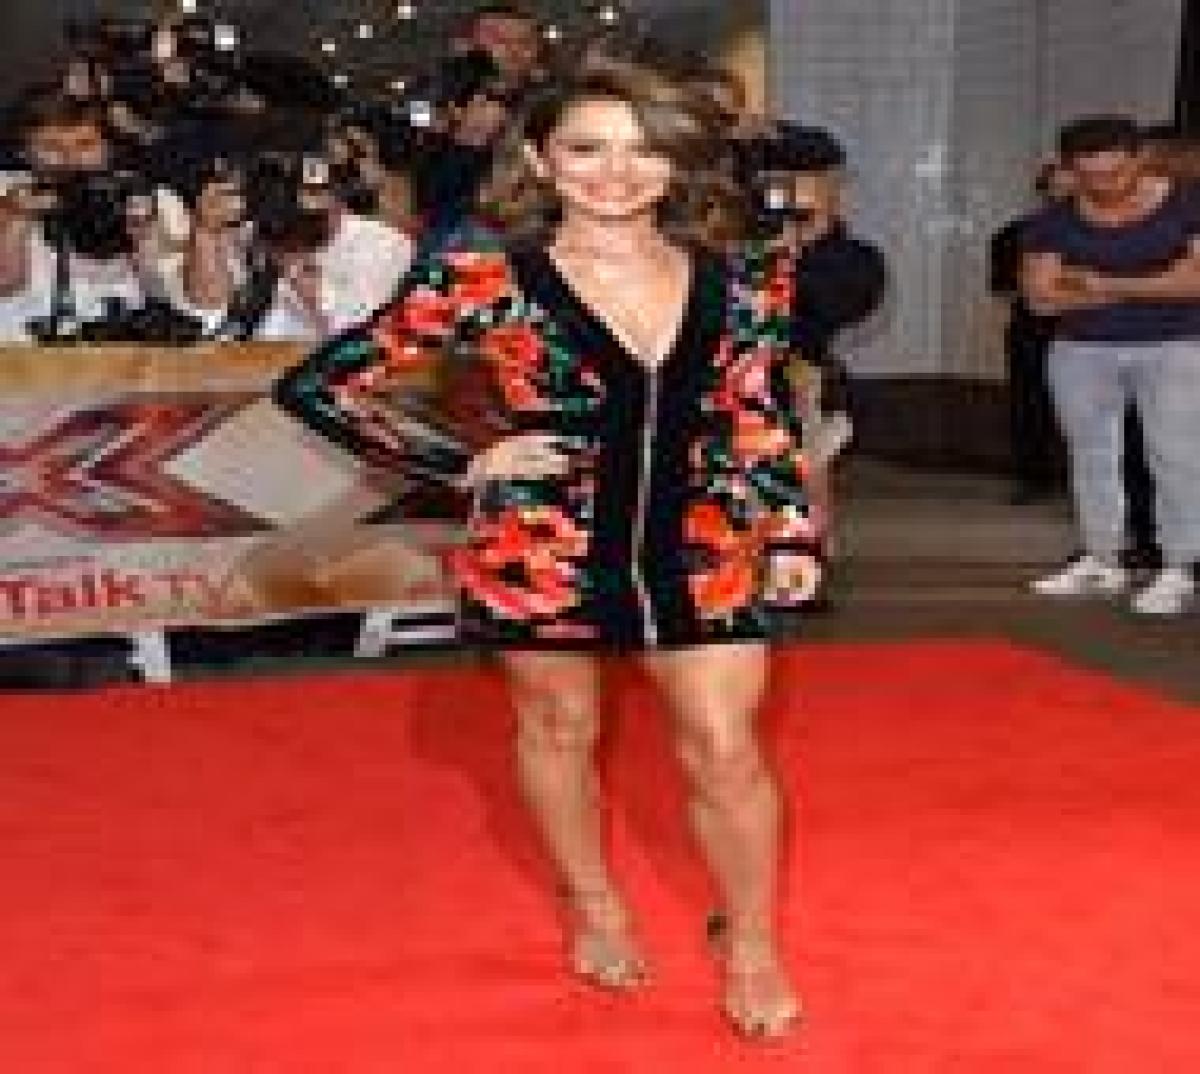 Cheryl Fernandez-Versini slams haters online